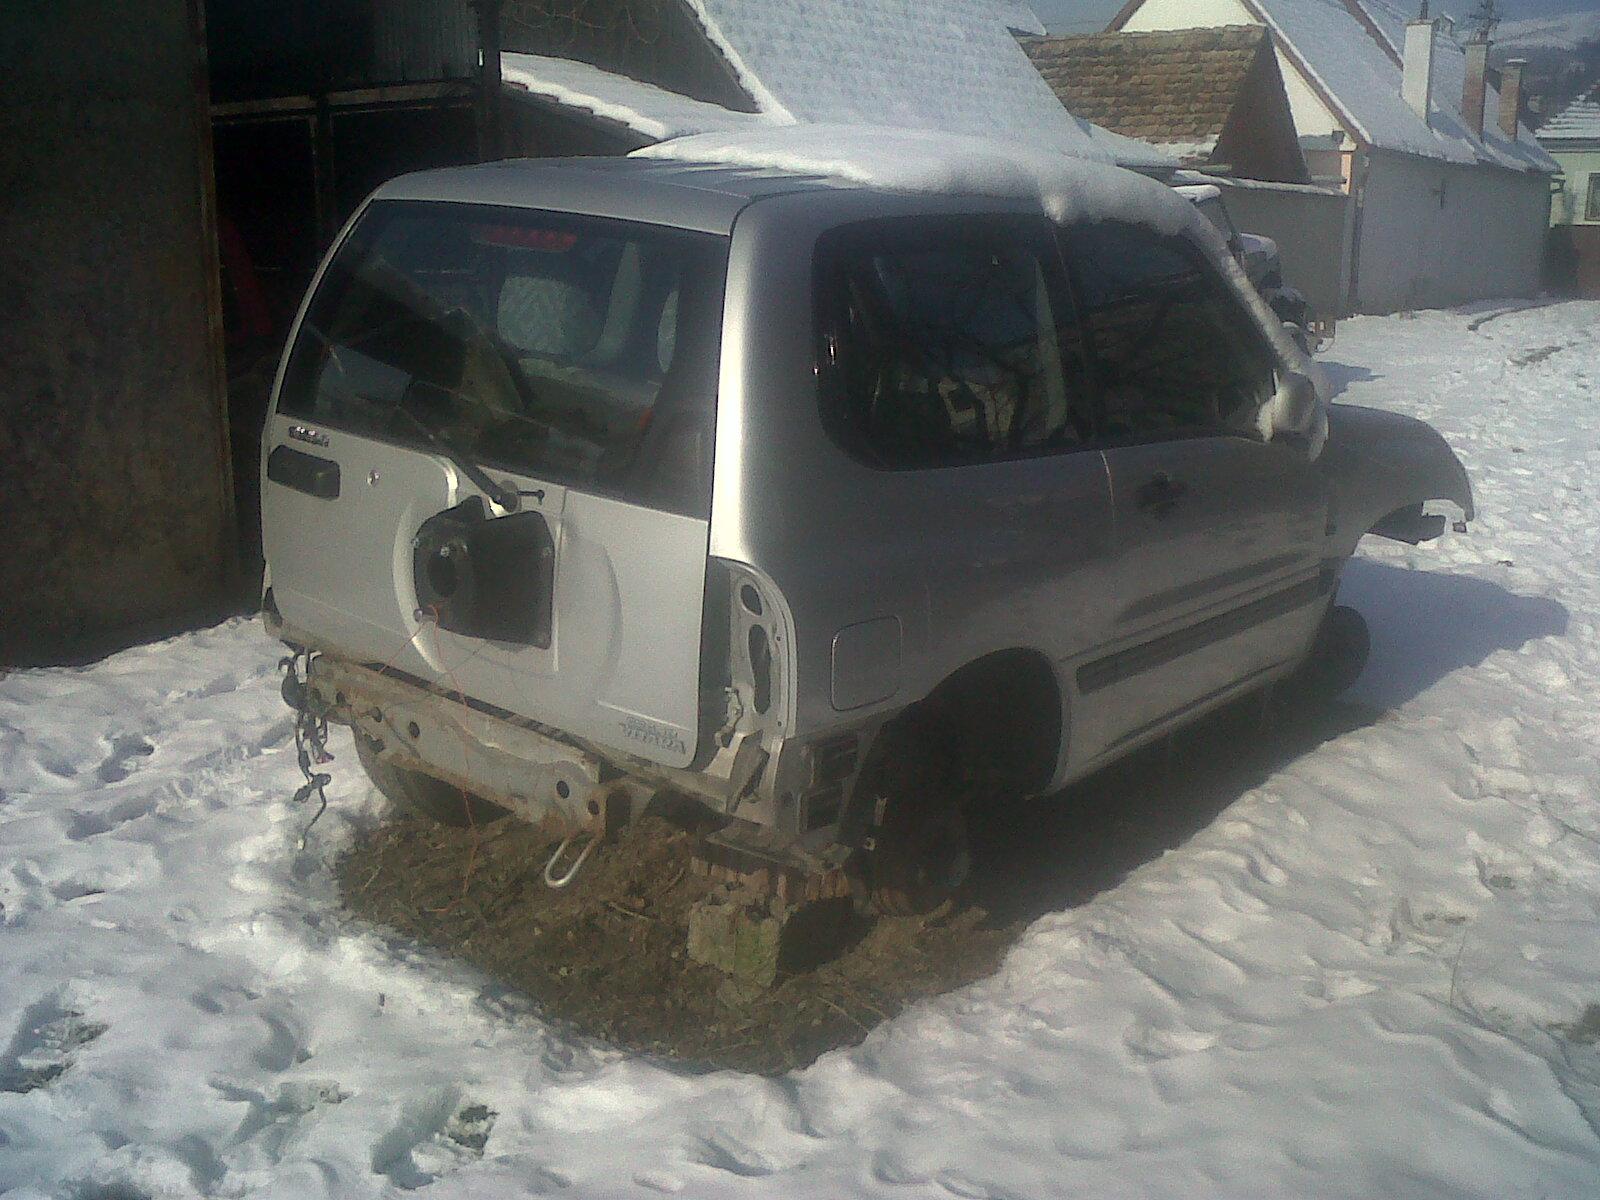 Dezmembrez Suzuki Vitara 2011 Benzina SUV - 31 Ianuarie 2011 - Poza 4